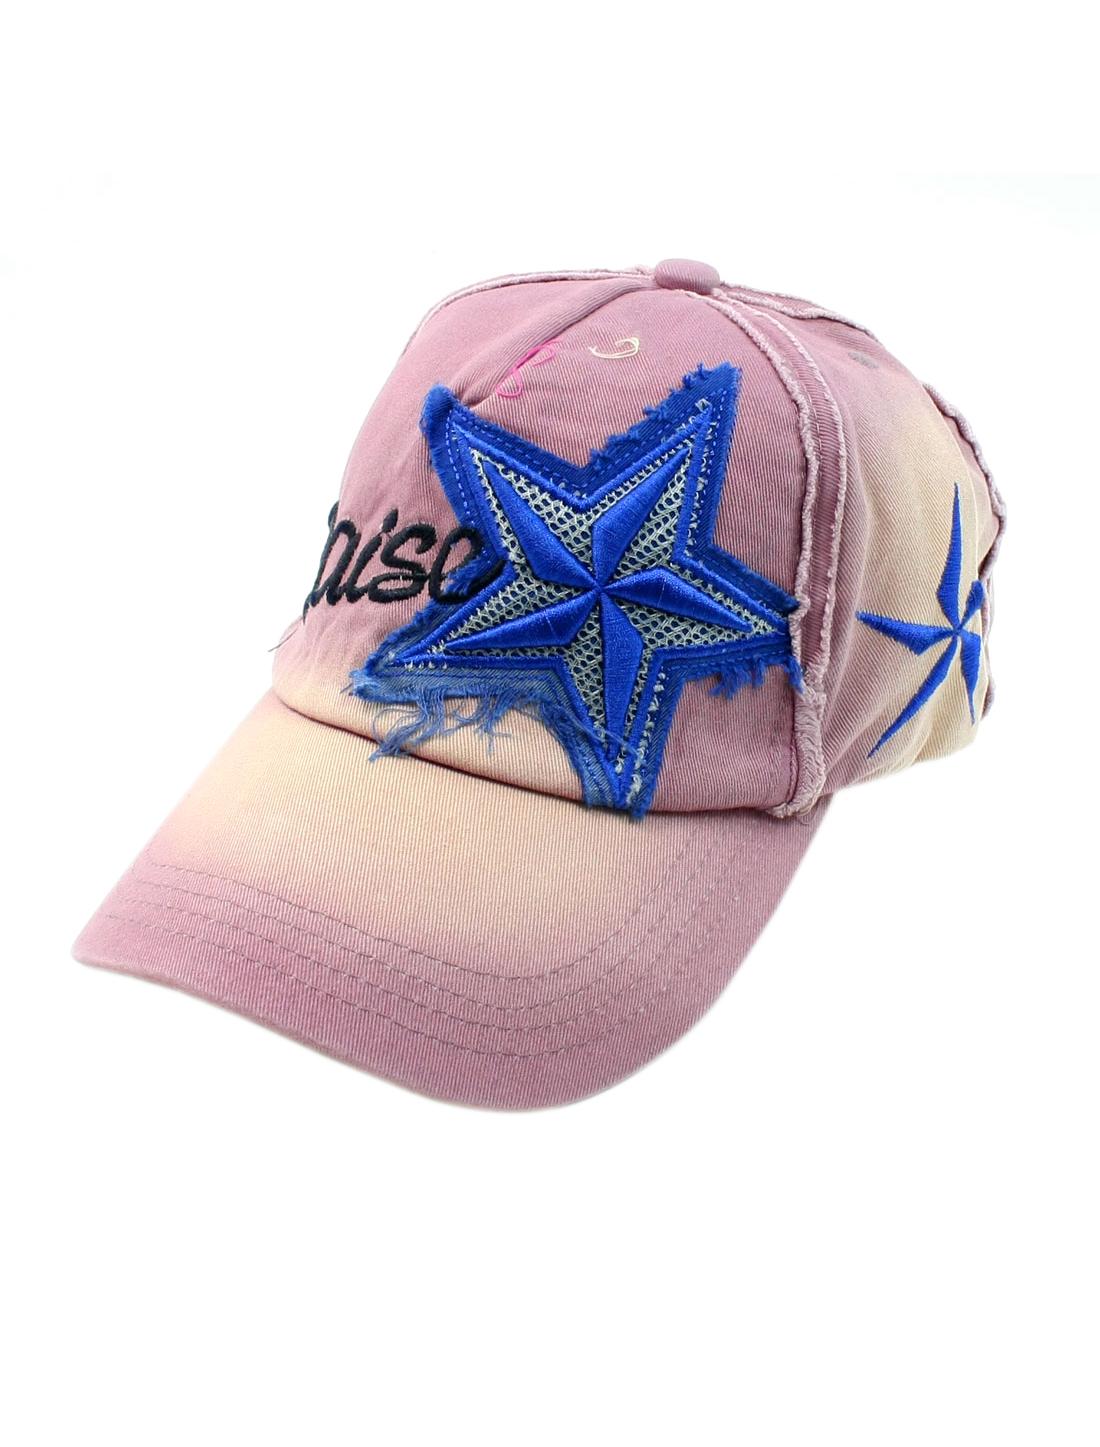 Unisex Slip Buckle Back Adjustable Fashional Casual Light Purple Baesball Cap